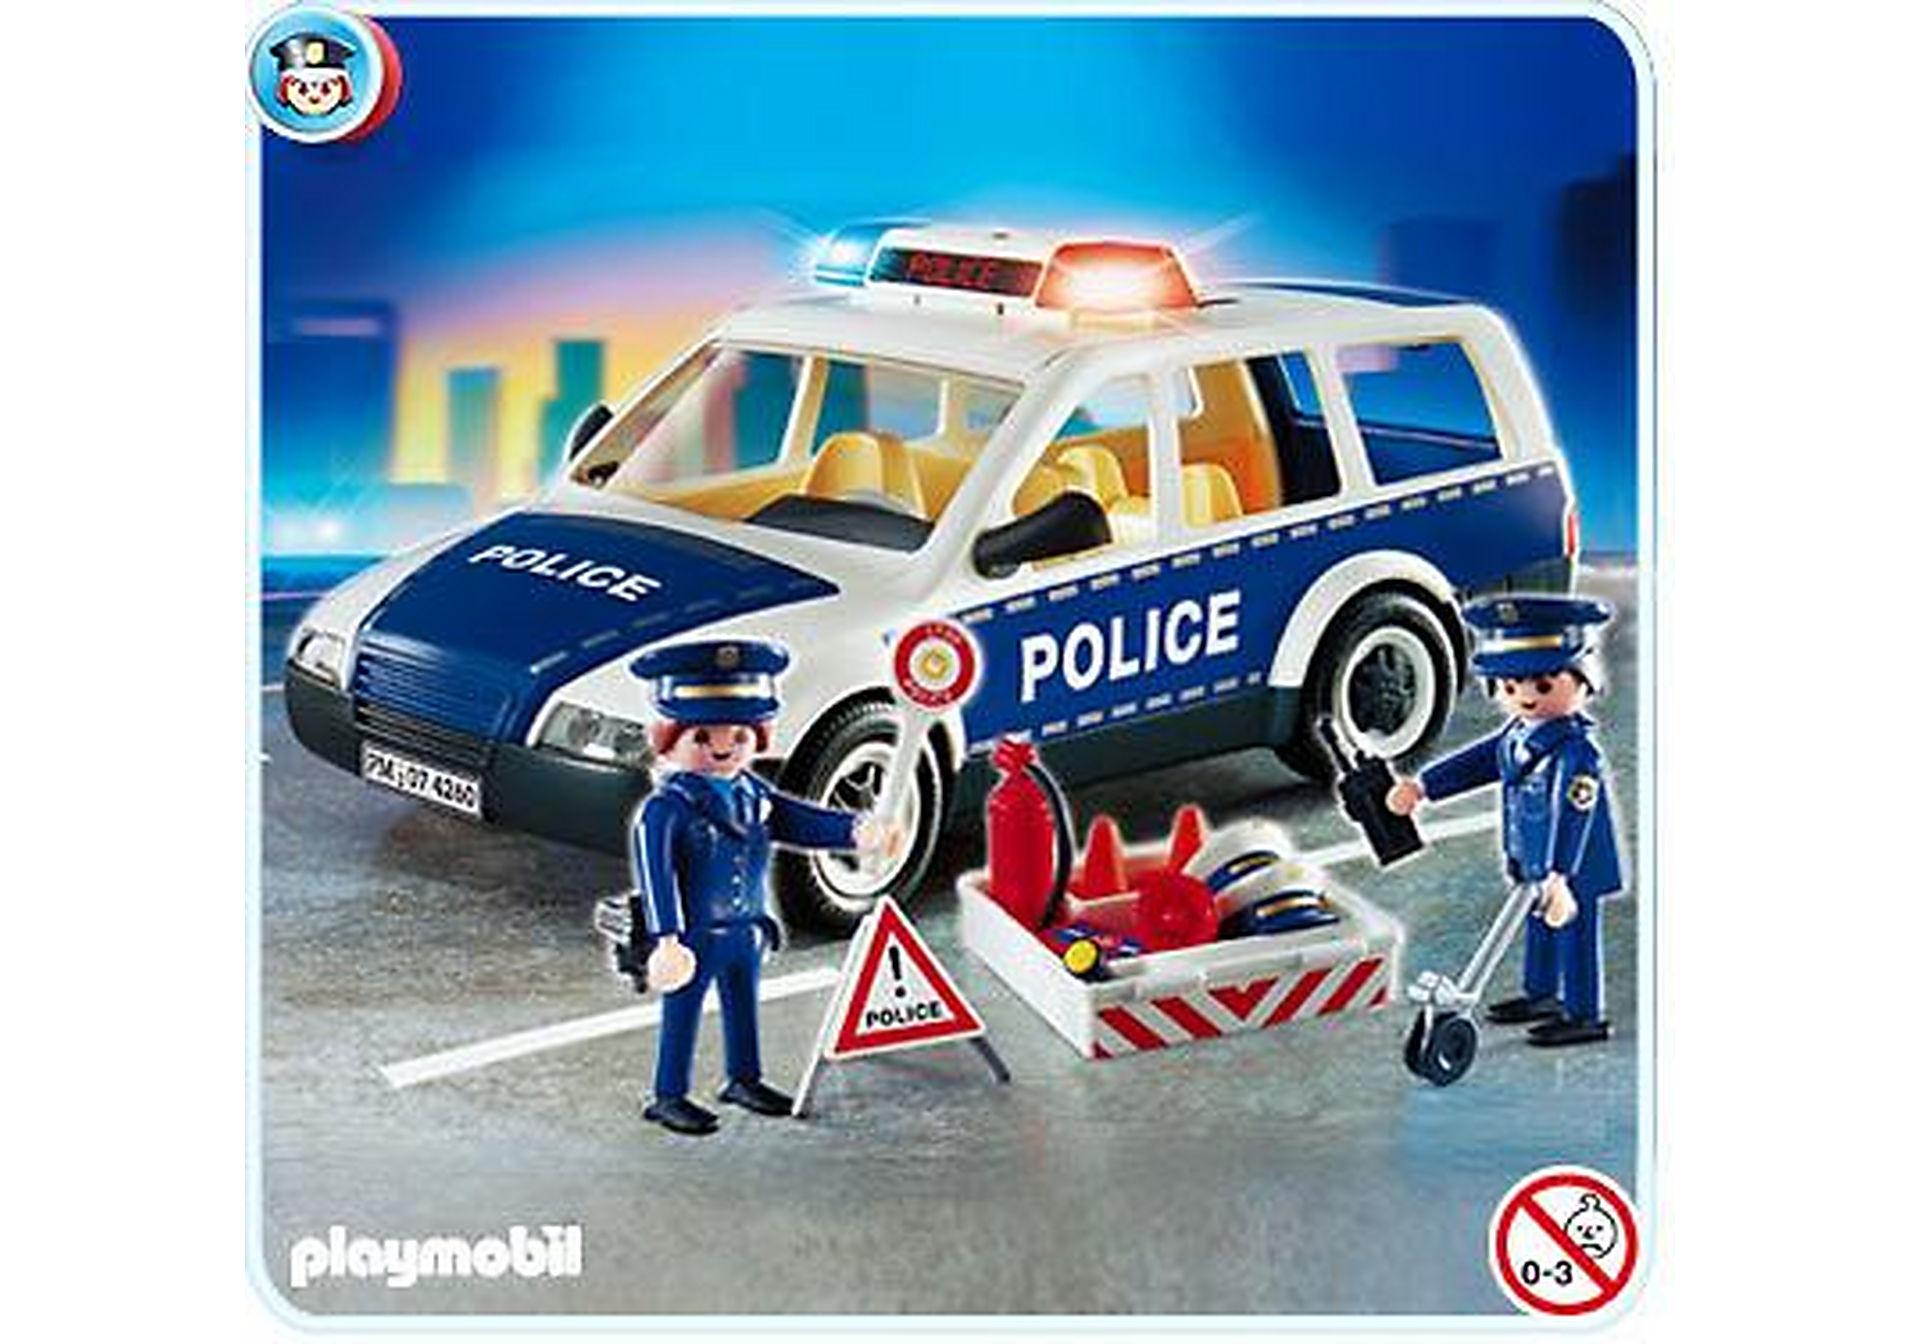 http://media.playmobil.com/i/playmobil/4260-A_product_detail/Voiture de police et patrouille